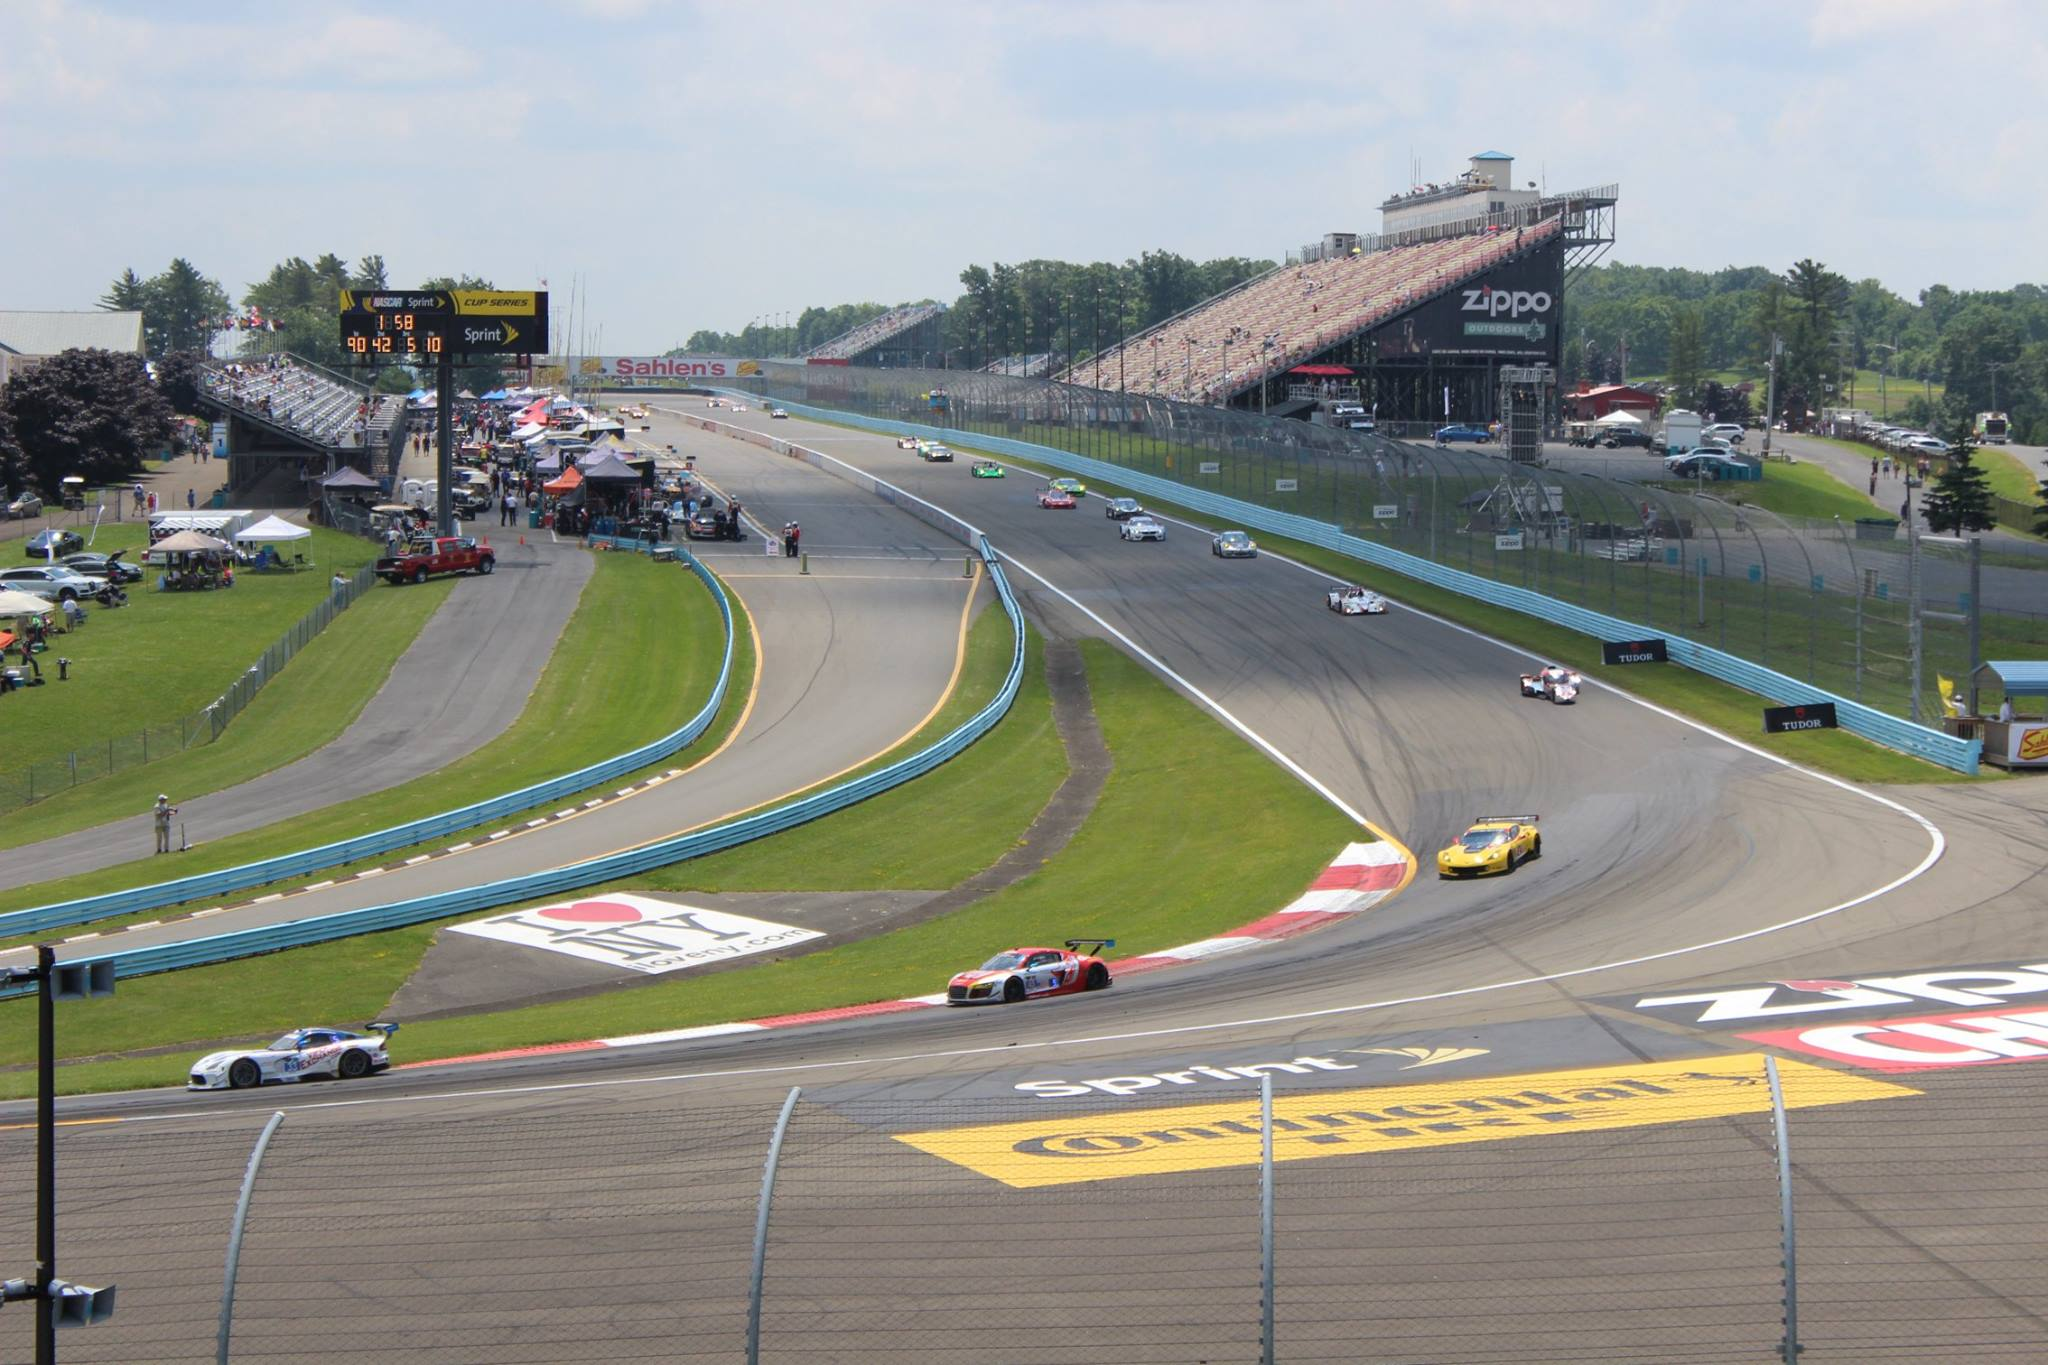 Circuito Watkins Glen : Gp of watkins glen gts gtsa rd pirelli world challenge